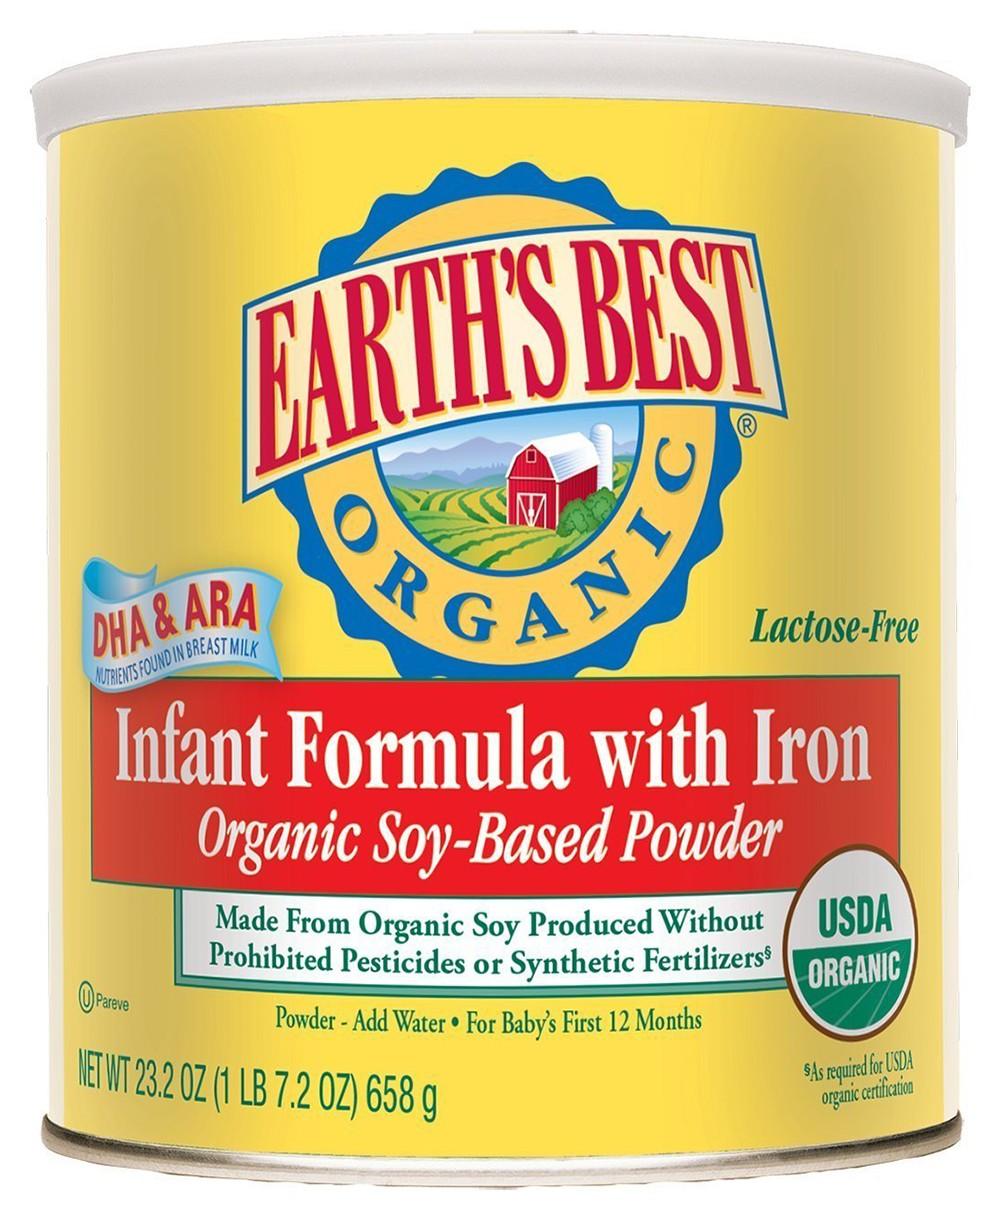 Earth best organic formula